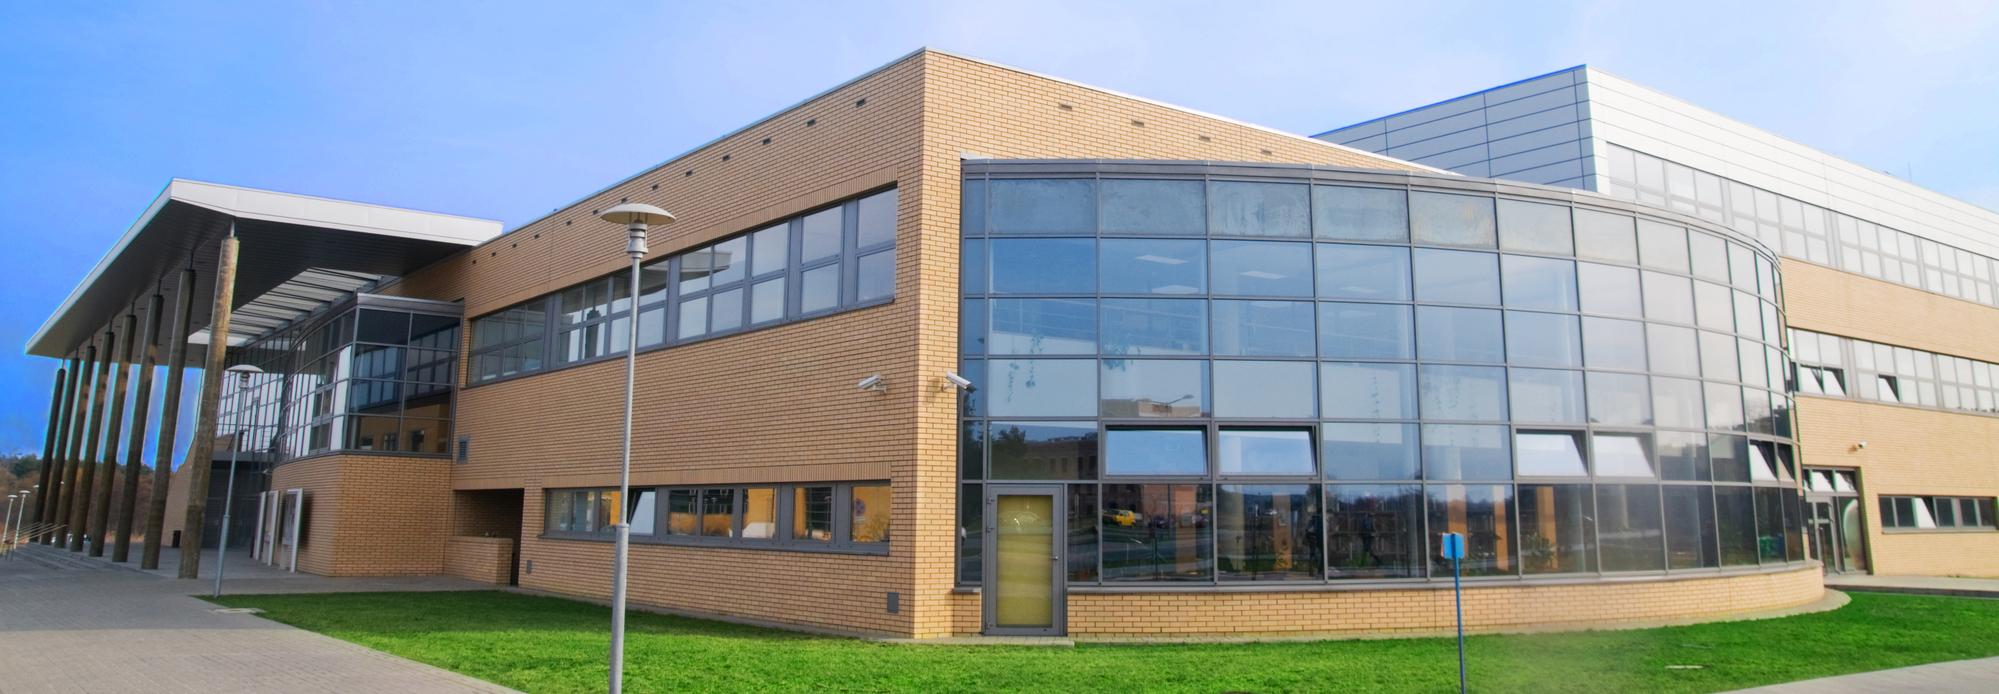 Modern office building